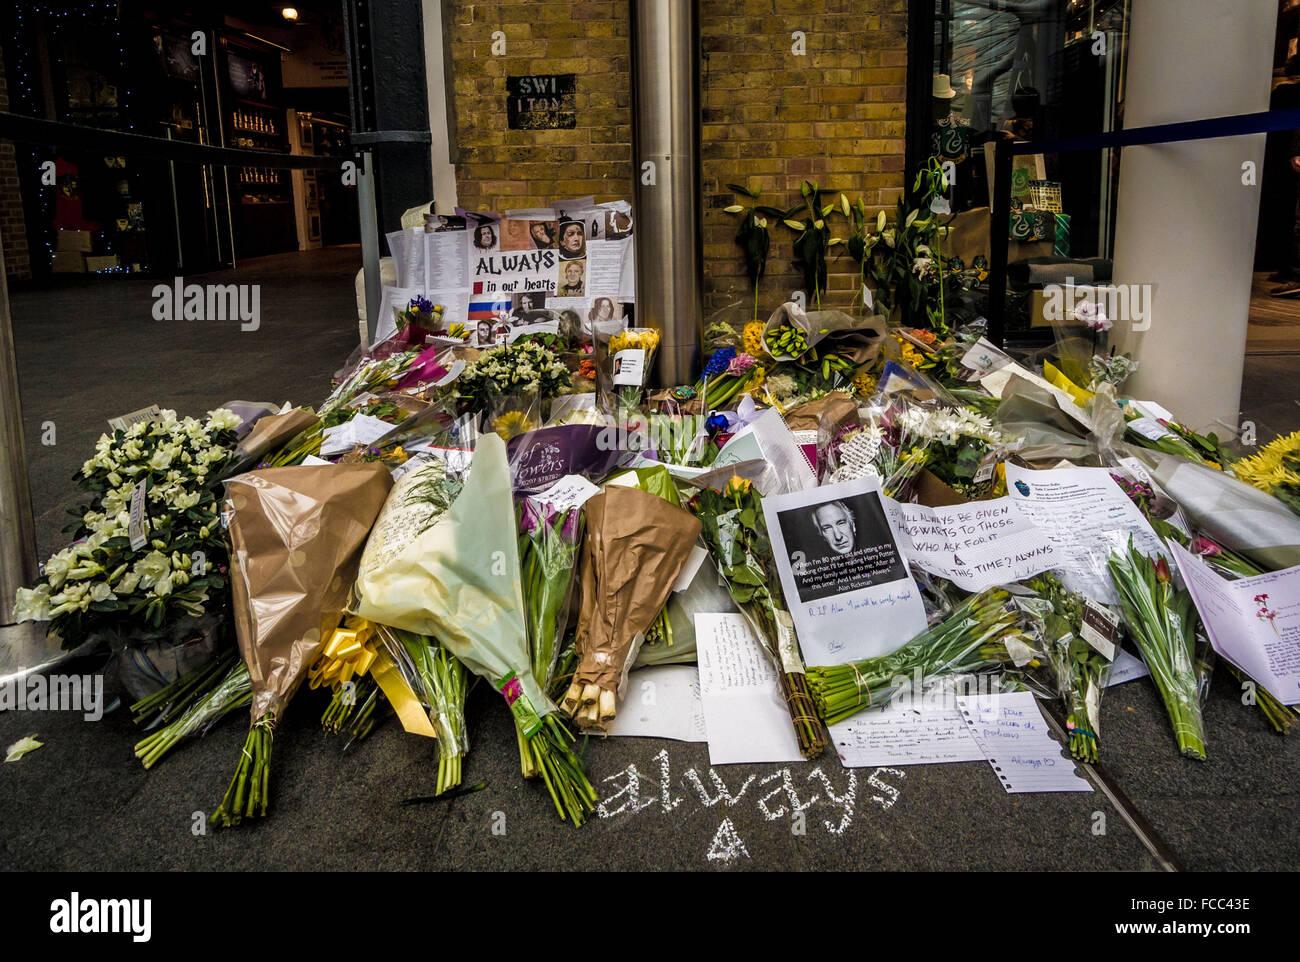 London, UK. 21st January, 2016. Tributes to actor Alan Rickman at Kings Cross Station. 'Platform 9 3/4', - Stock Image